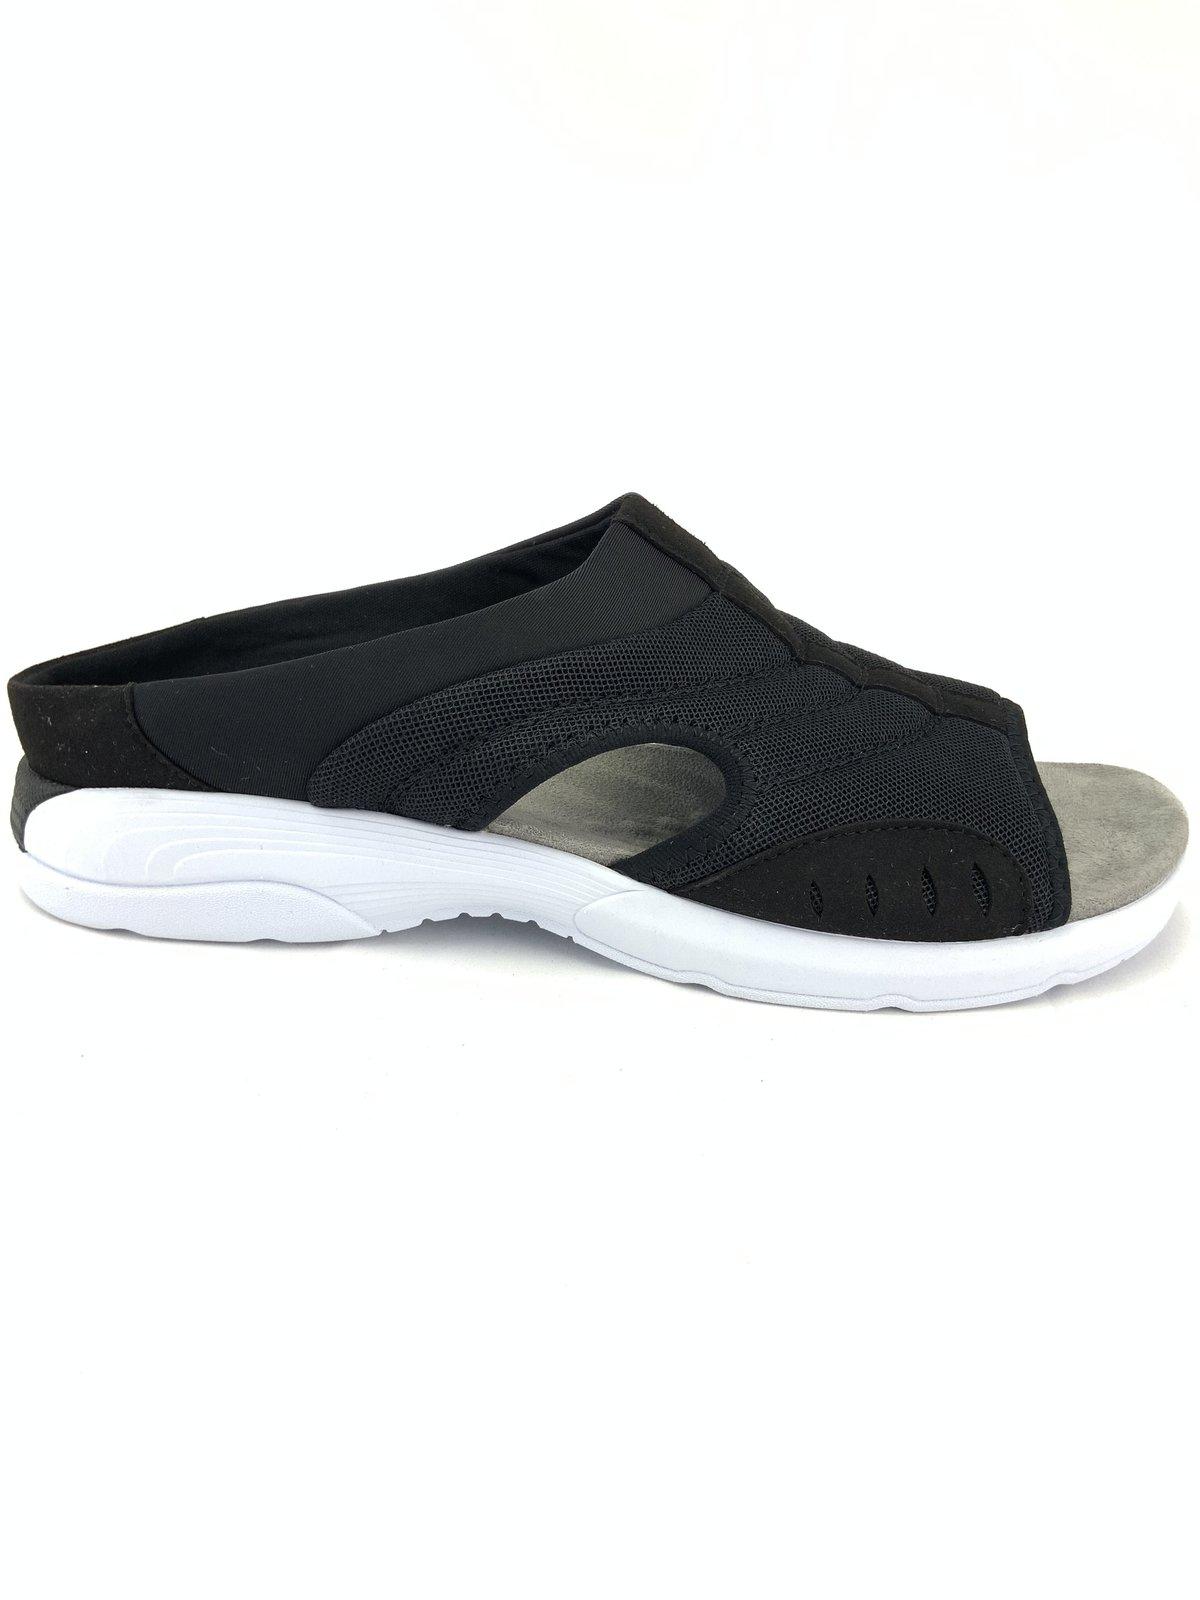 Easy Spirit Setraciee Sandals Size 10M - $51.55 CAD